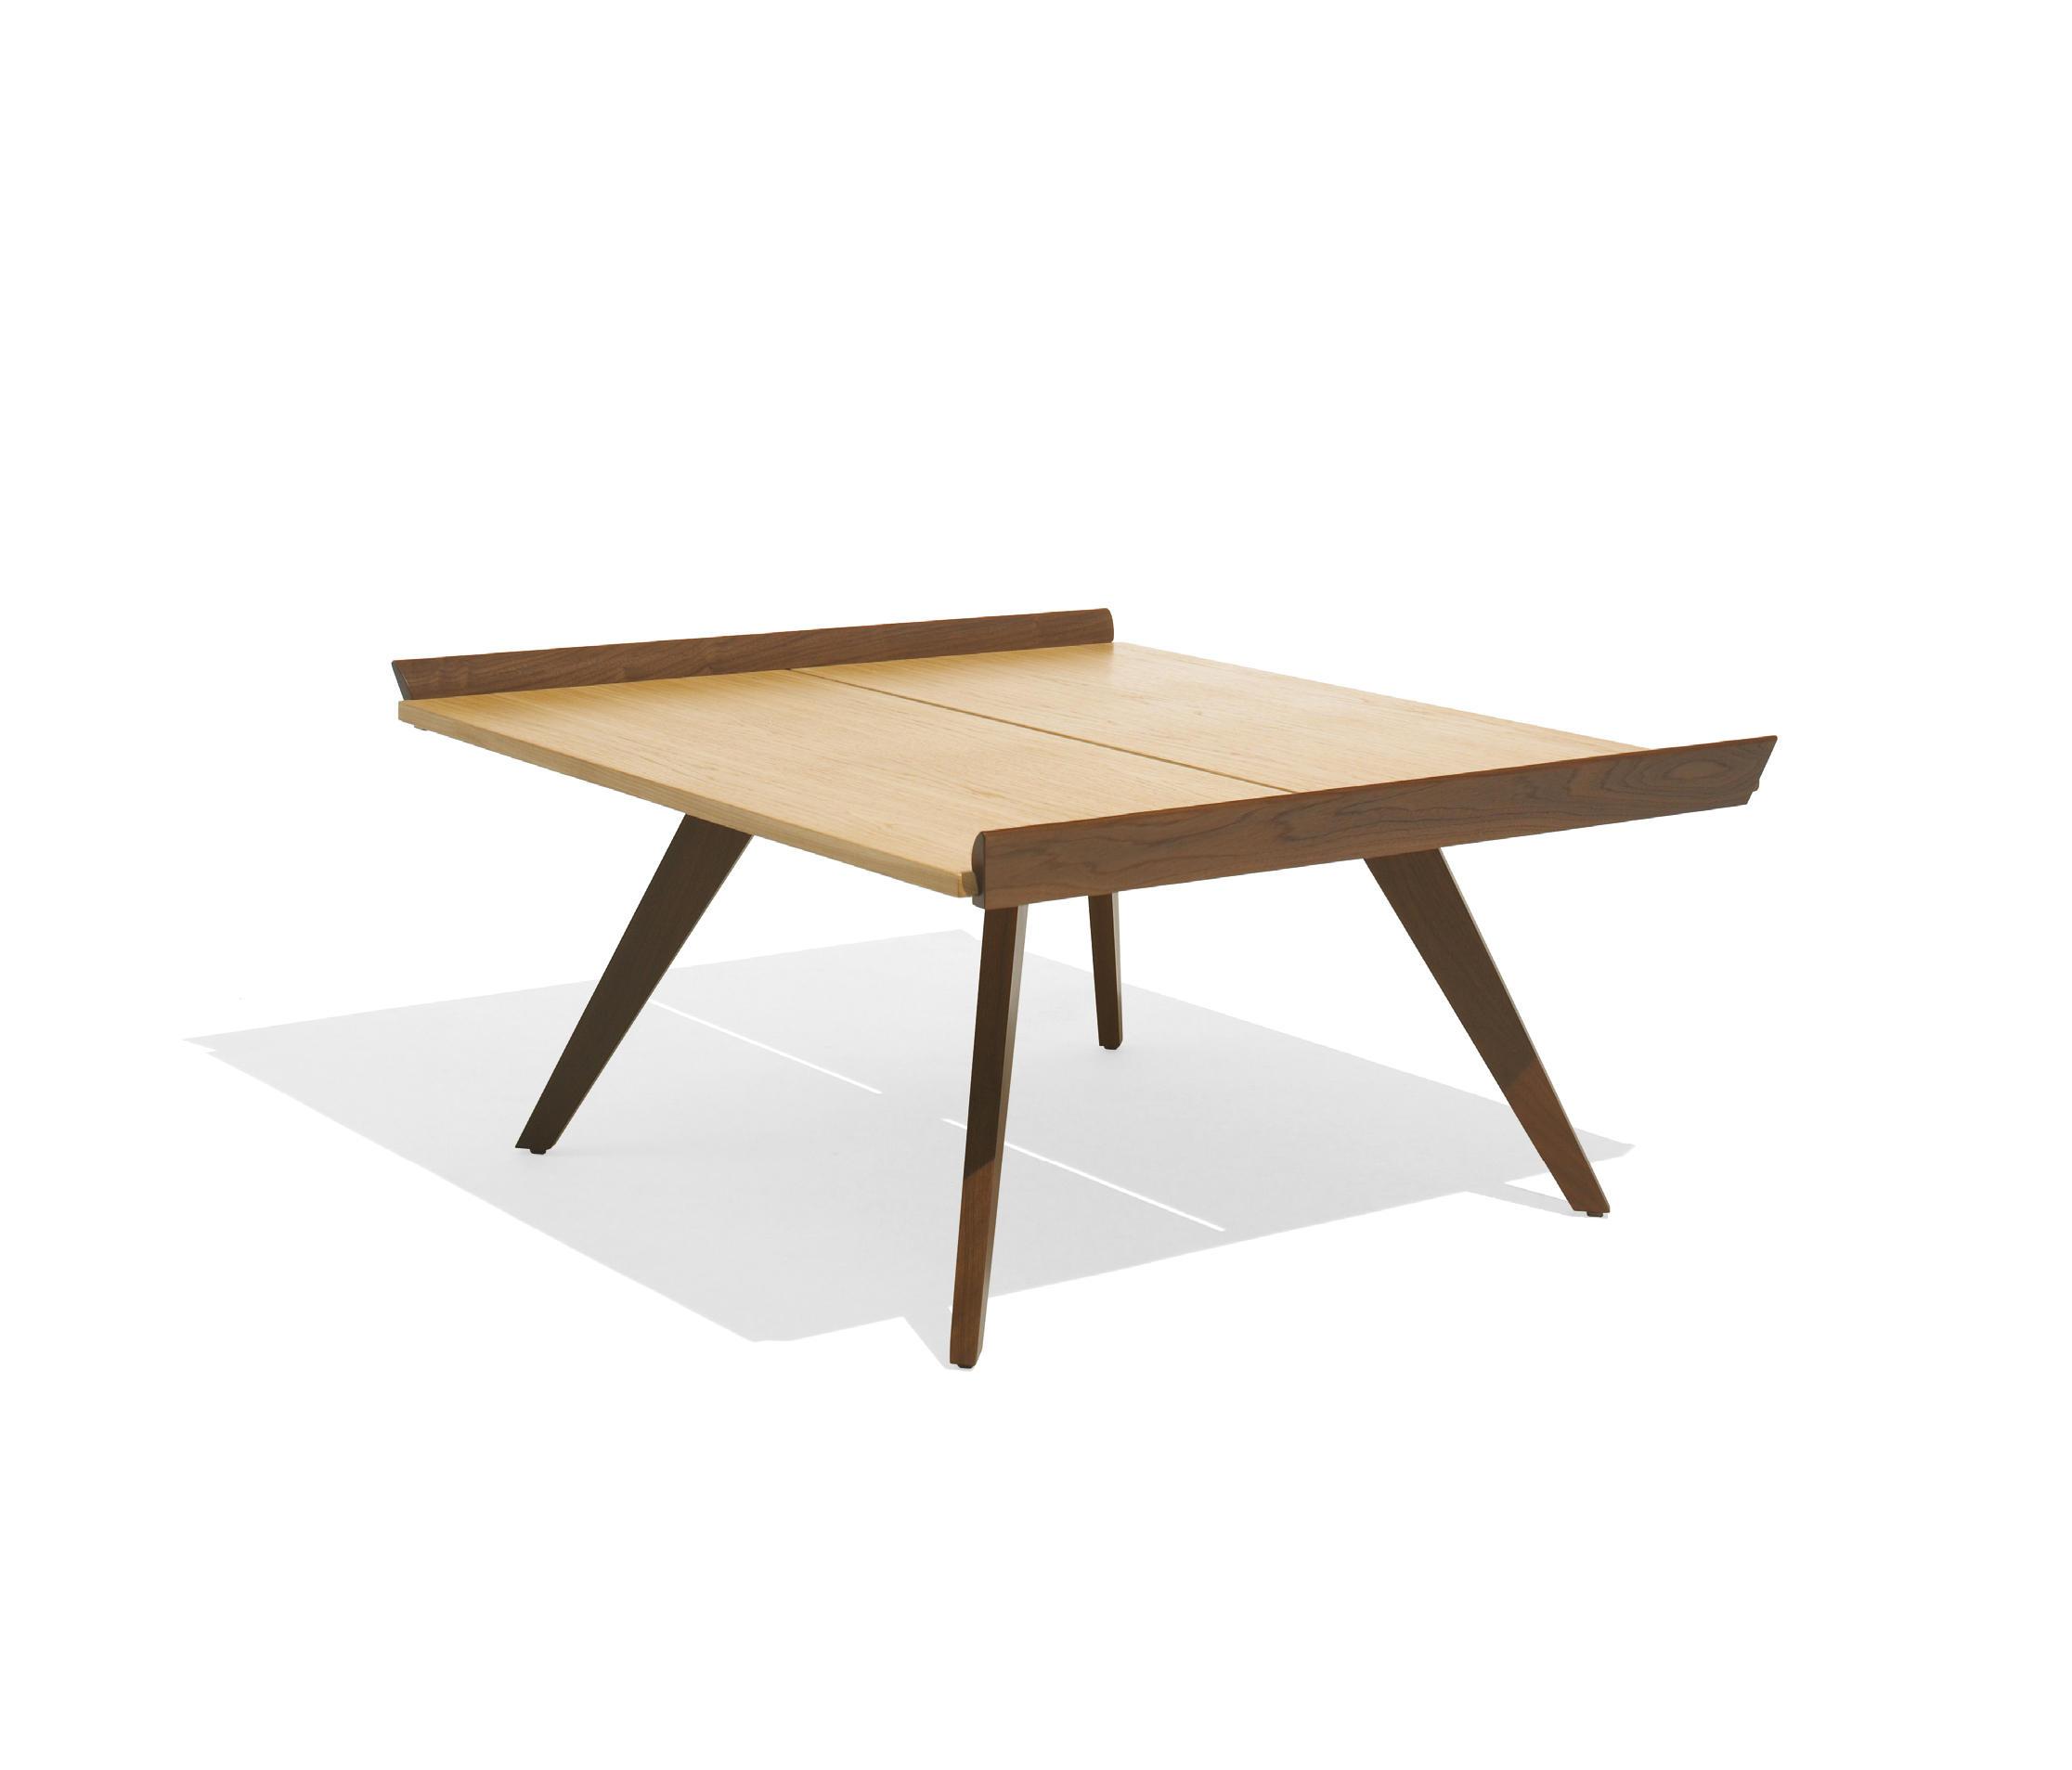 nakashima splay leg table basse plateau tables basses de knoll international architonic. Black Bedroom Furniture Sets. Home Design Ideas